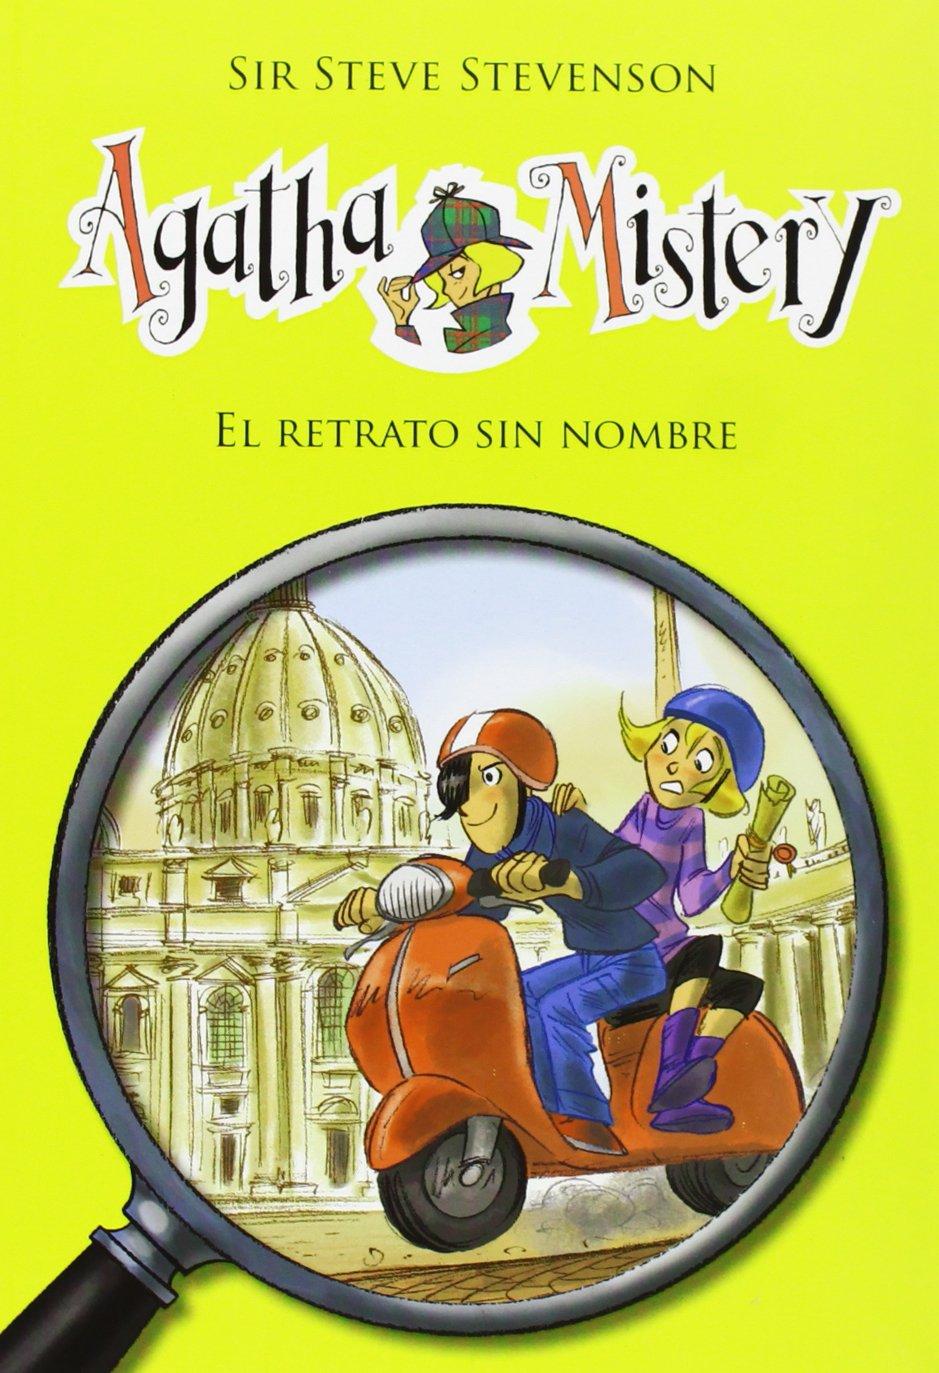 Agatha Mistery: El retrato sin nombre # 11 (Spanish Edition) (Spanish) Paperback – July 31, 2015